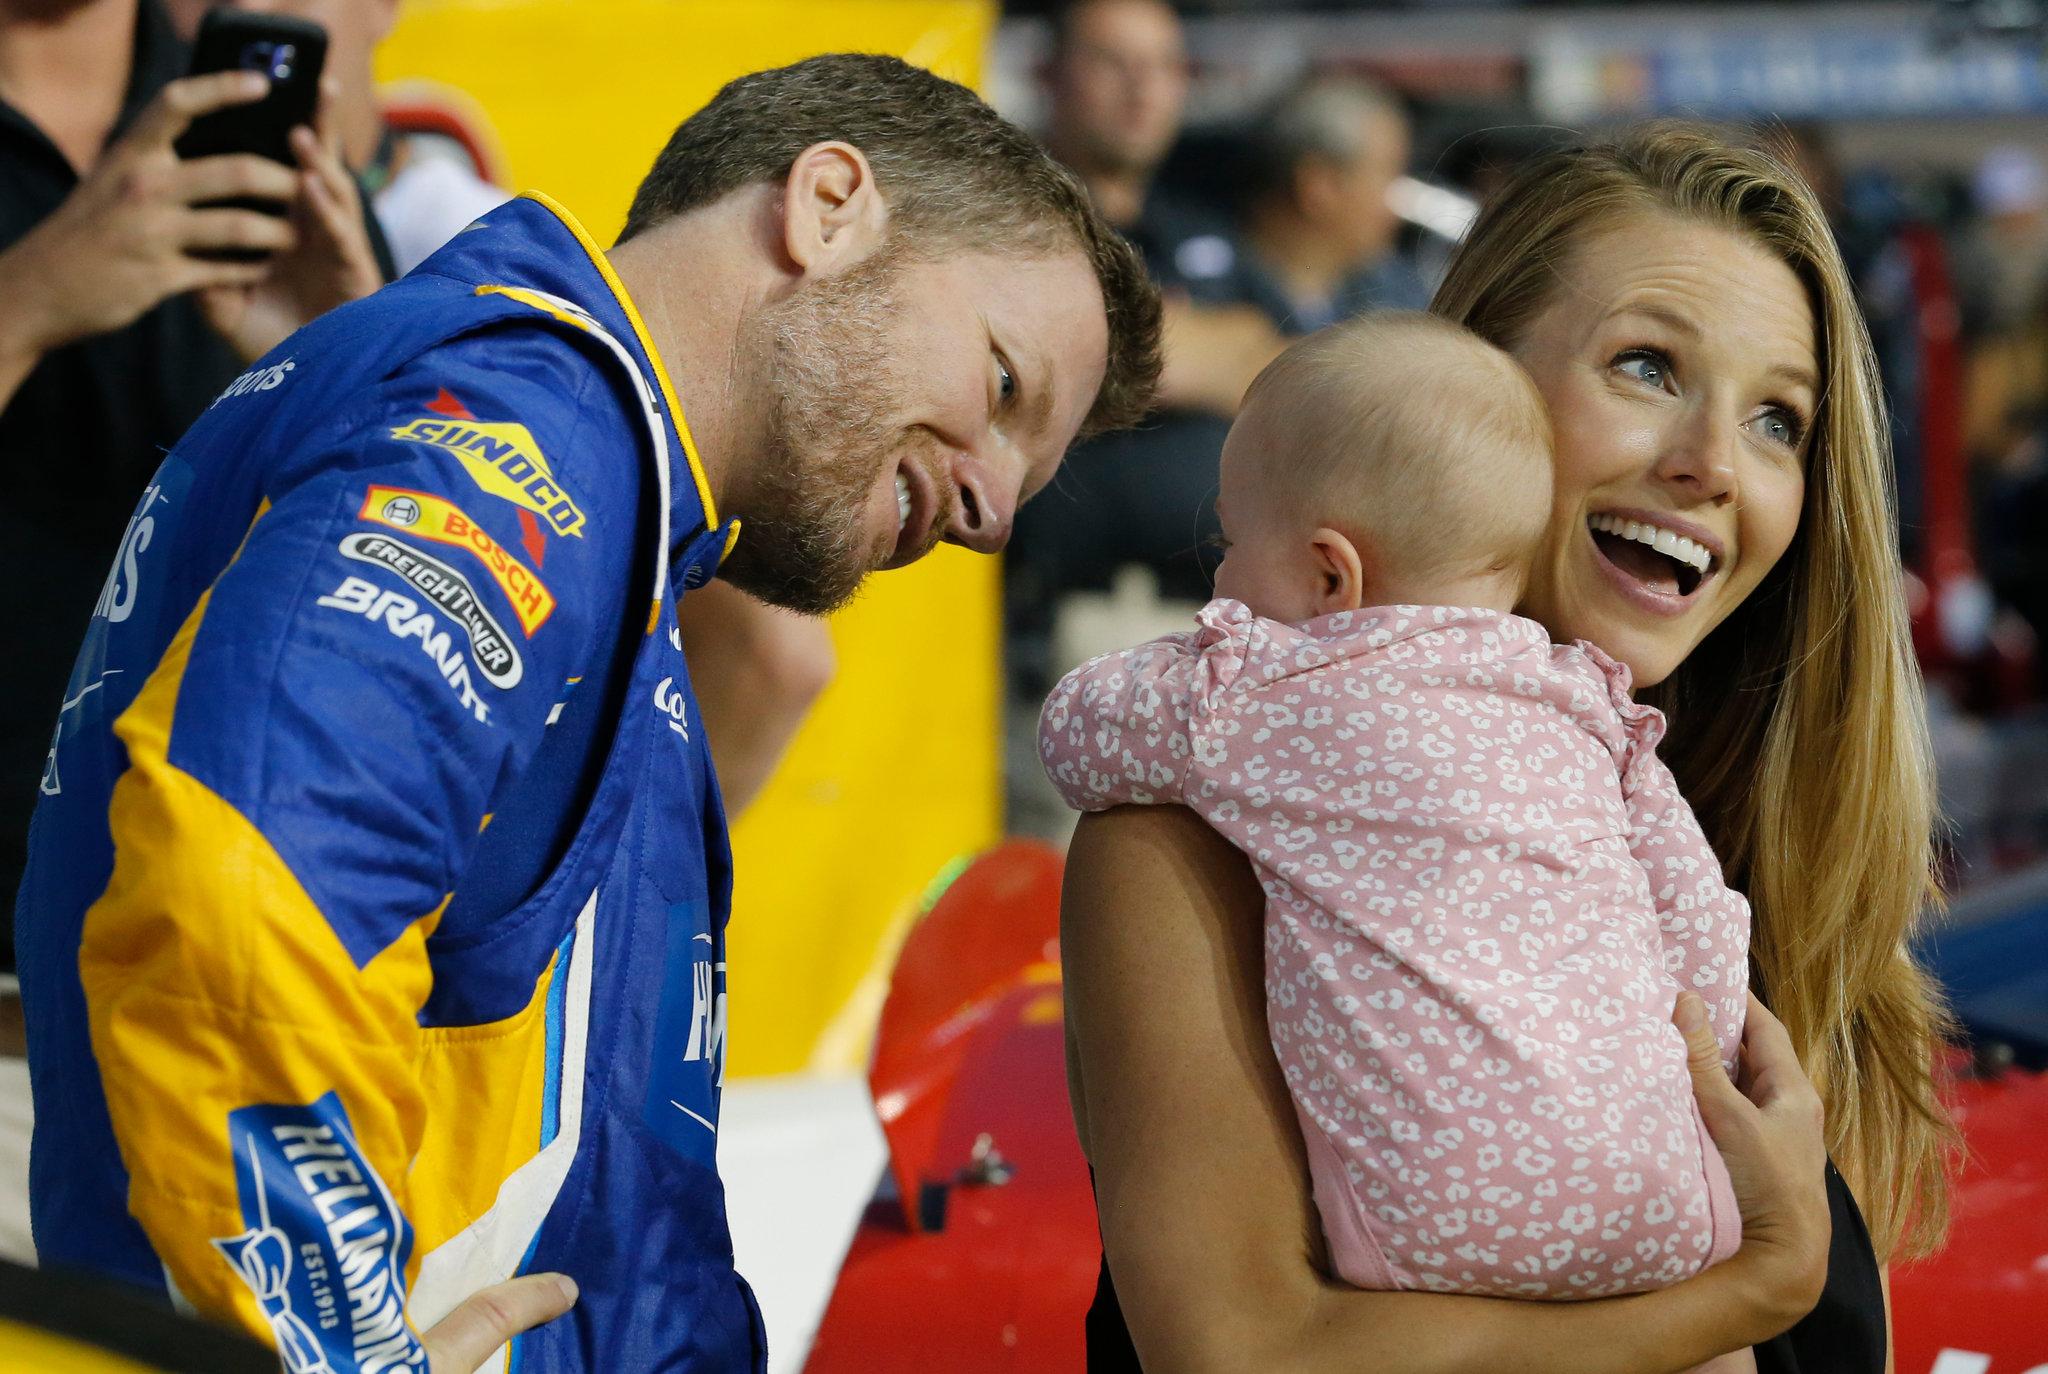 Dale Earnhardt Jr Family